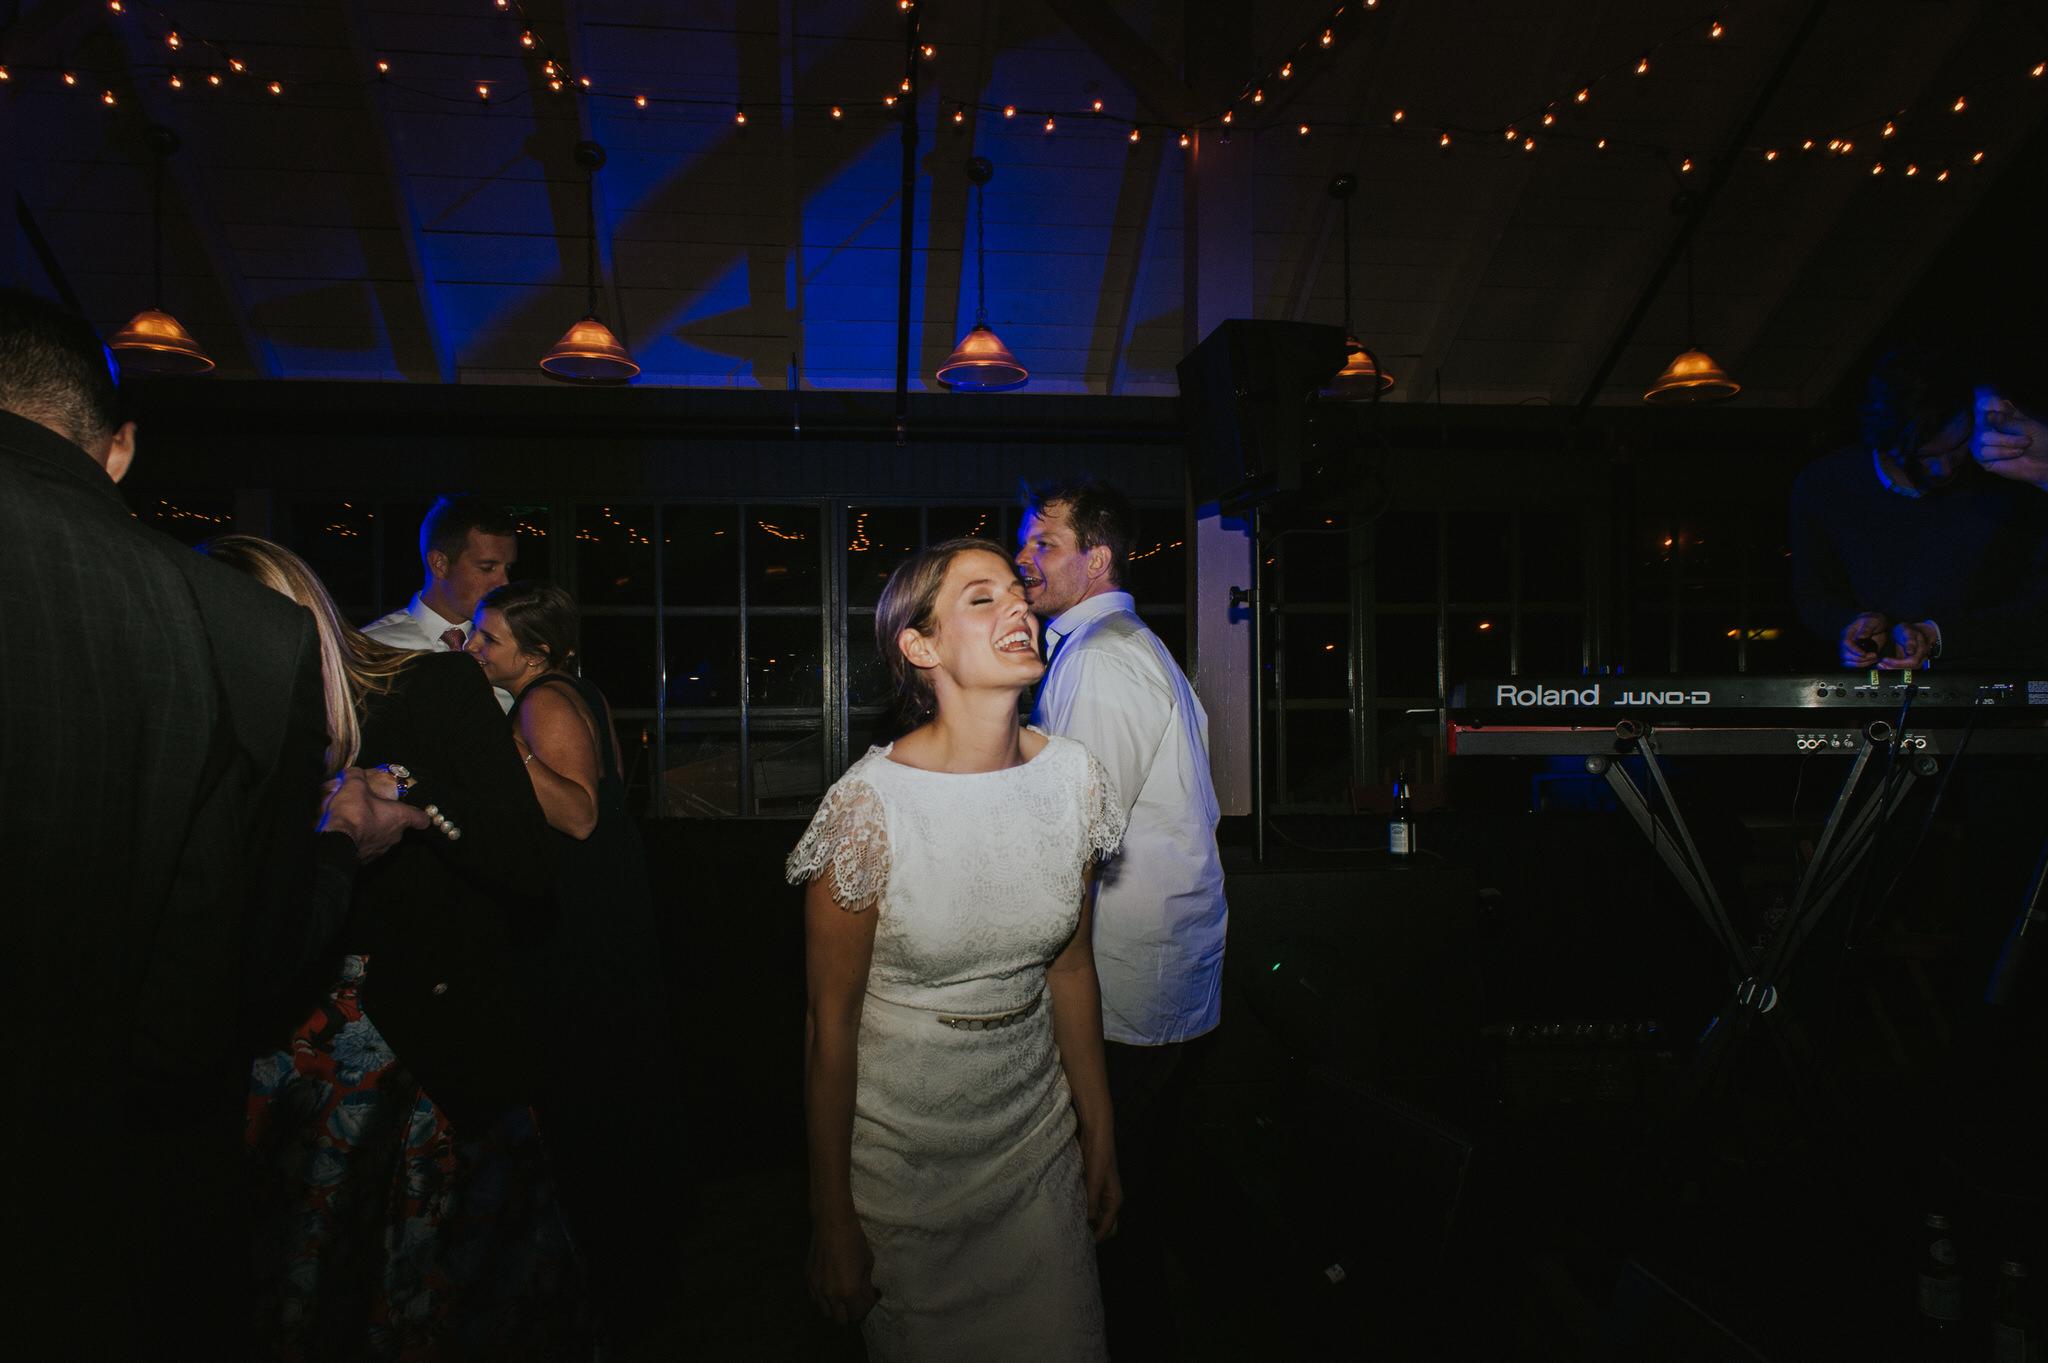 scarletoneillphotography_weddingphotography_prince edward county weddings231.JPG